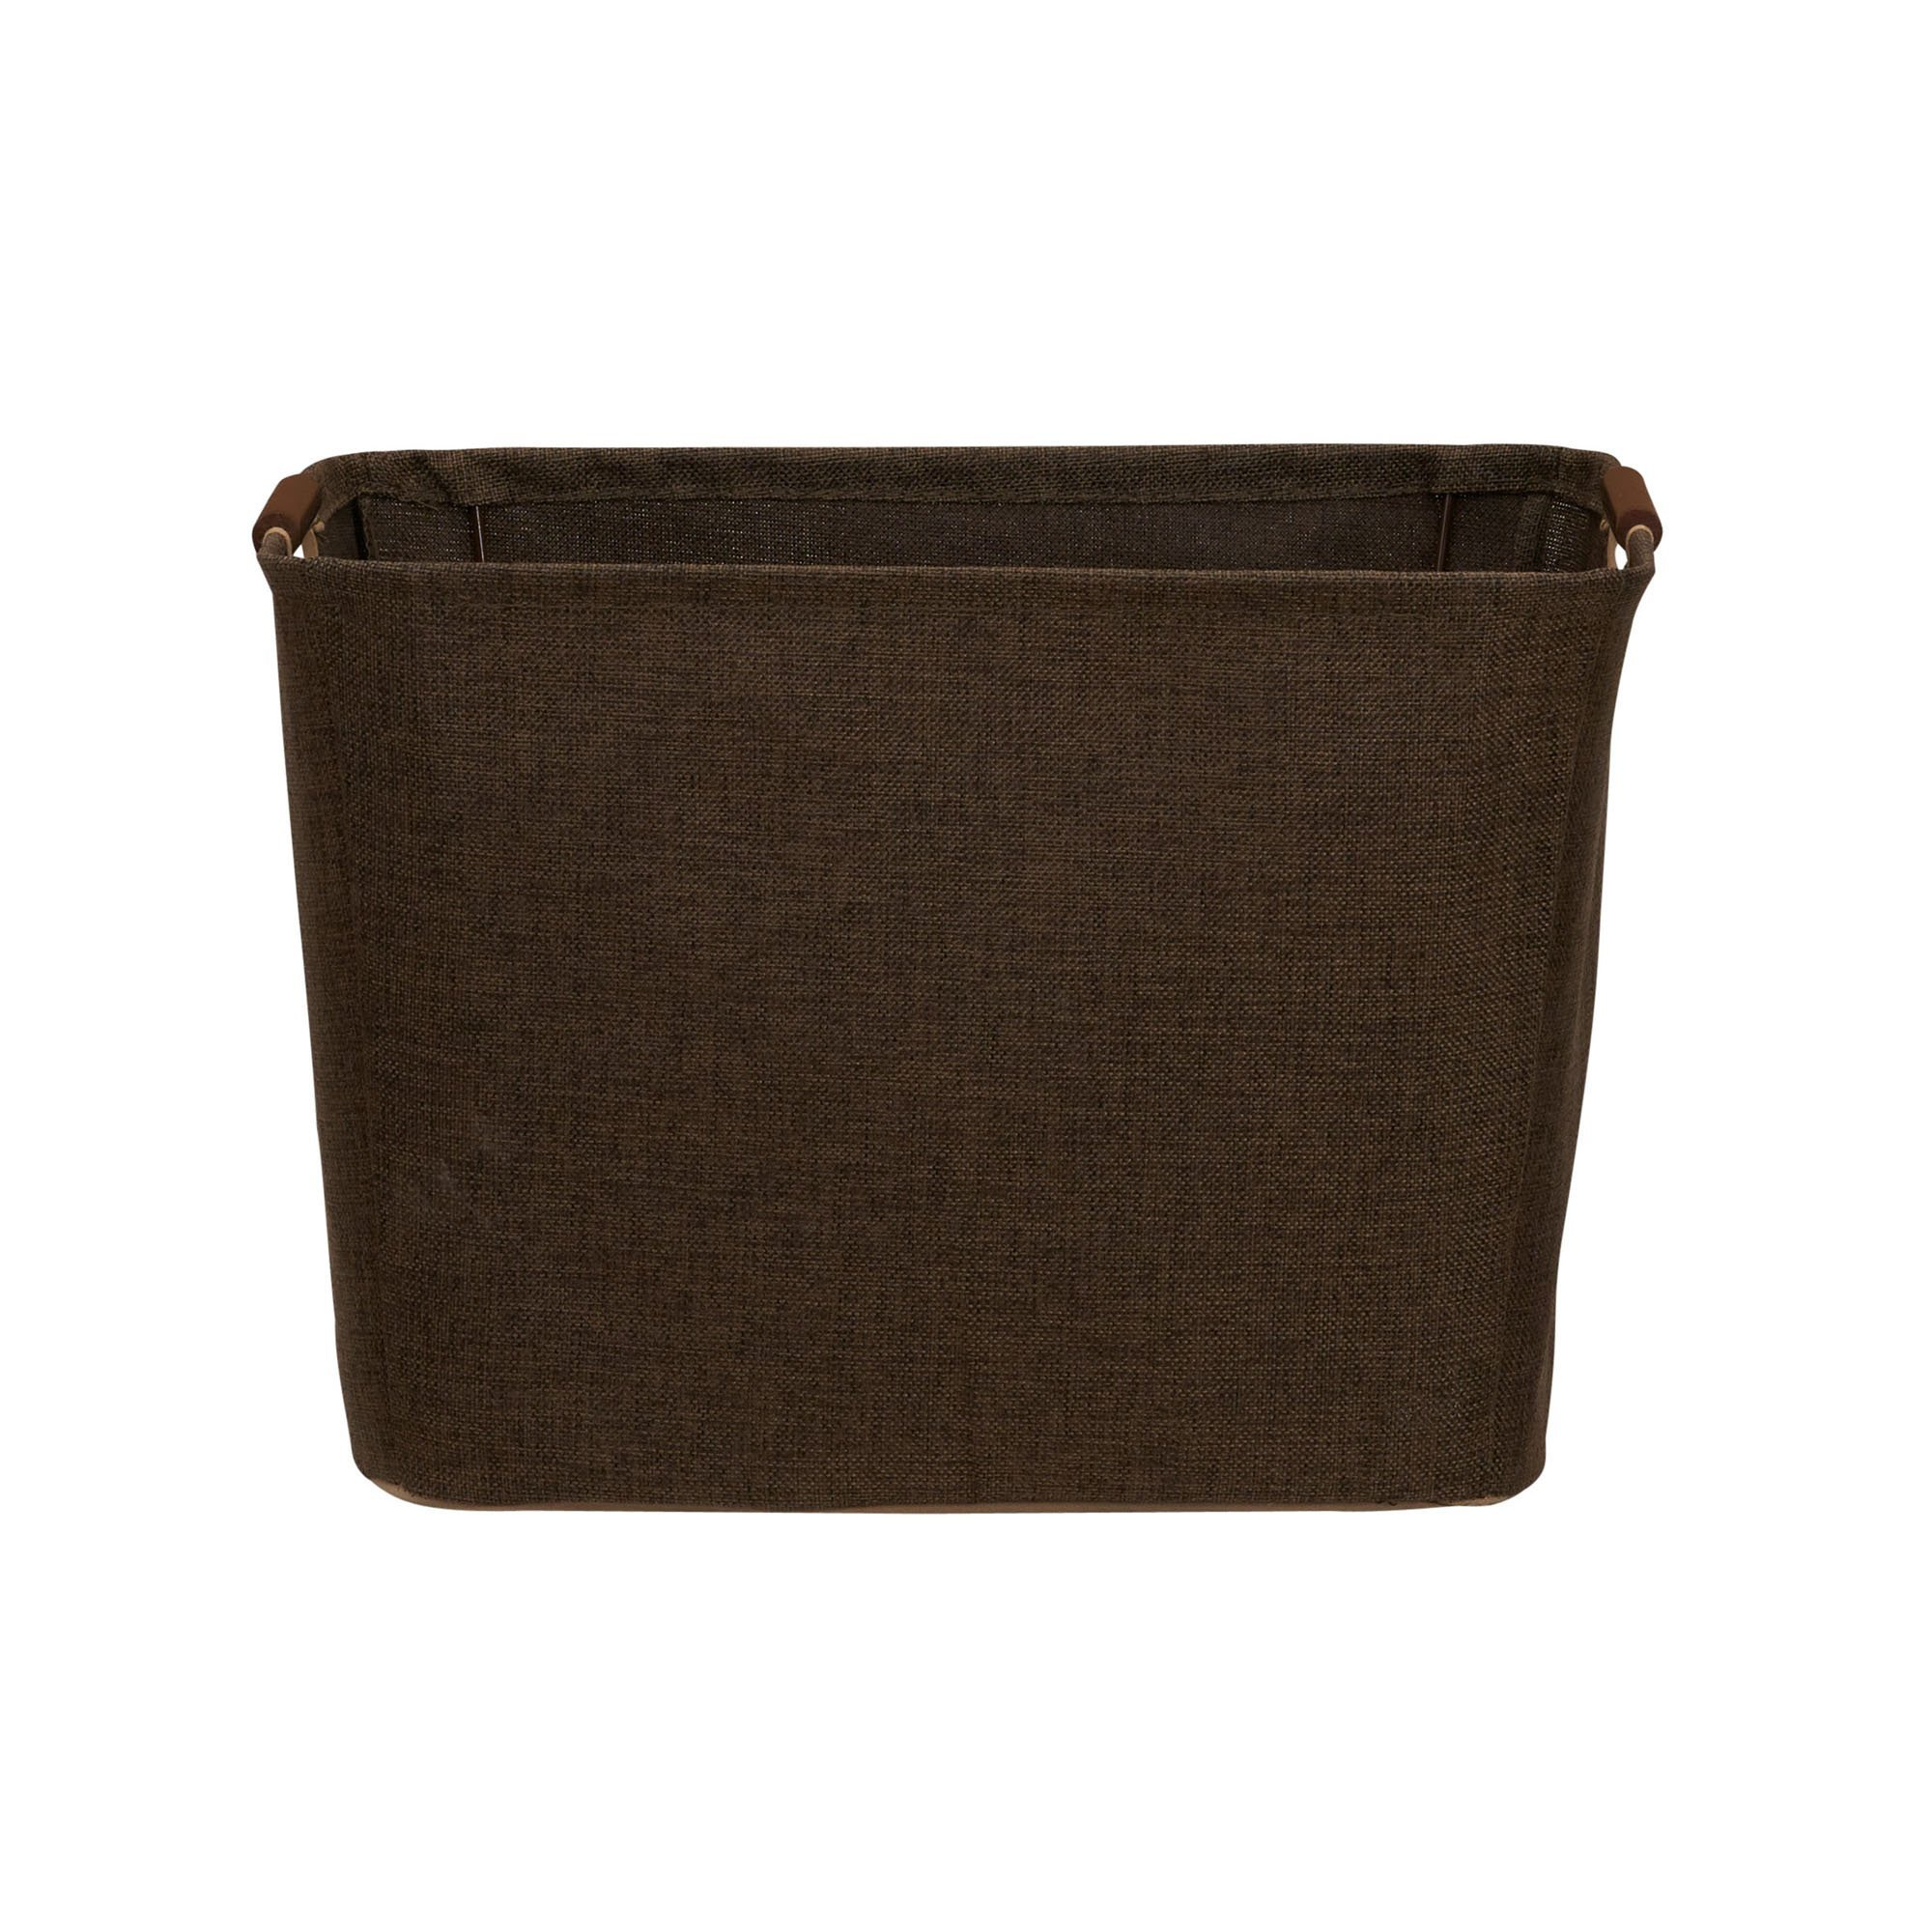 Household Essentials 601 Medium Shelf Basket with Wood Handles   Multi-Purpose Home Storage Bin   Brown Coffee Linen